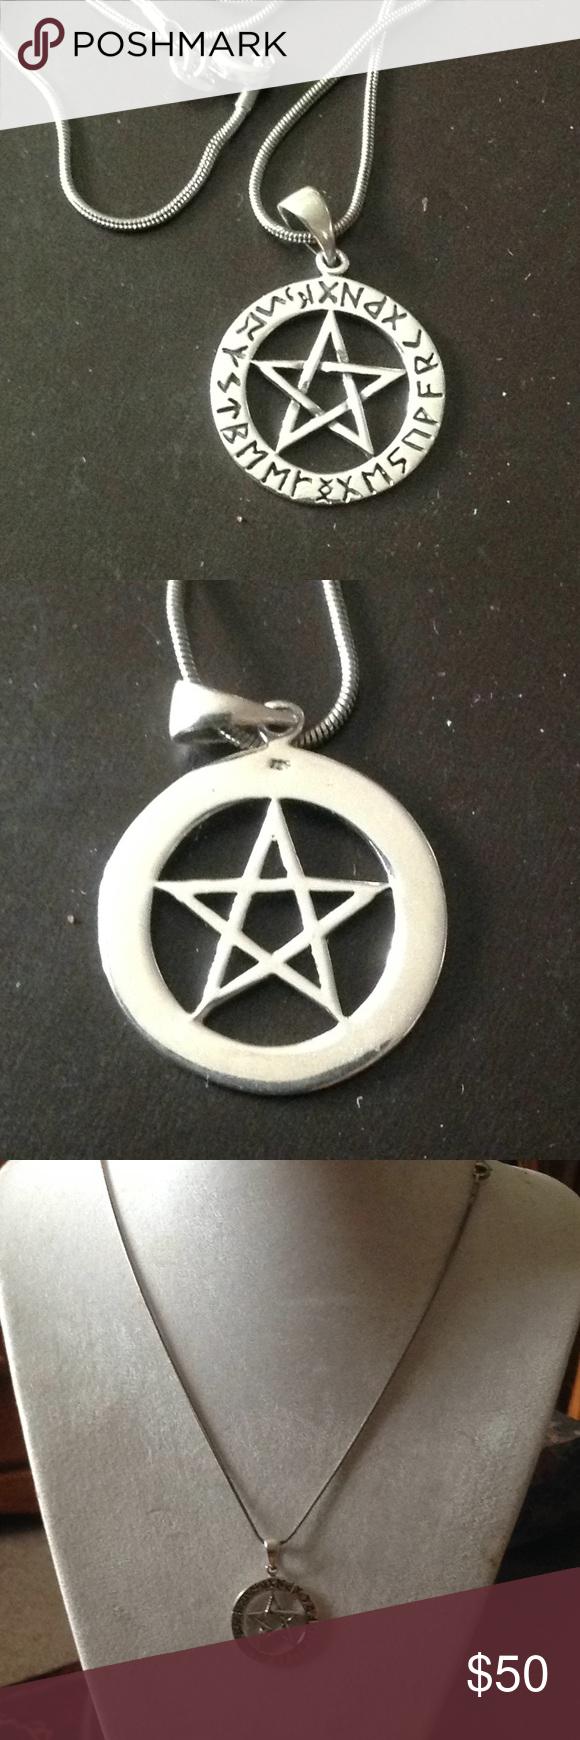 SALEM pentagram necklace sale